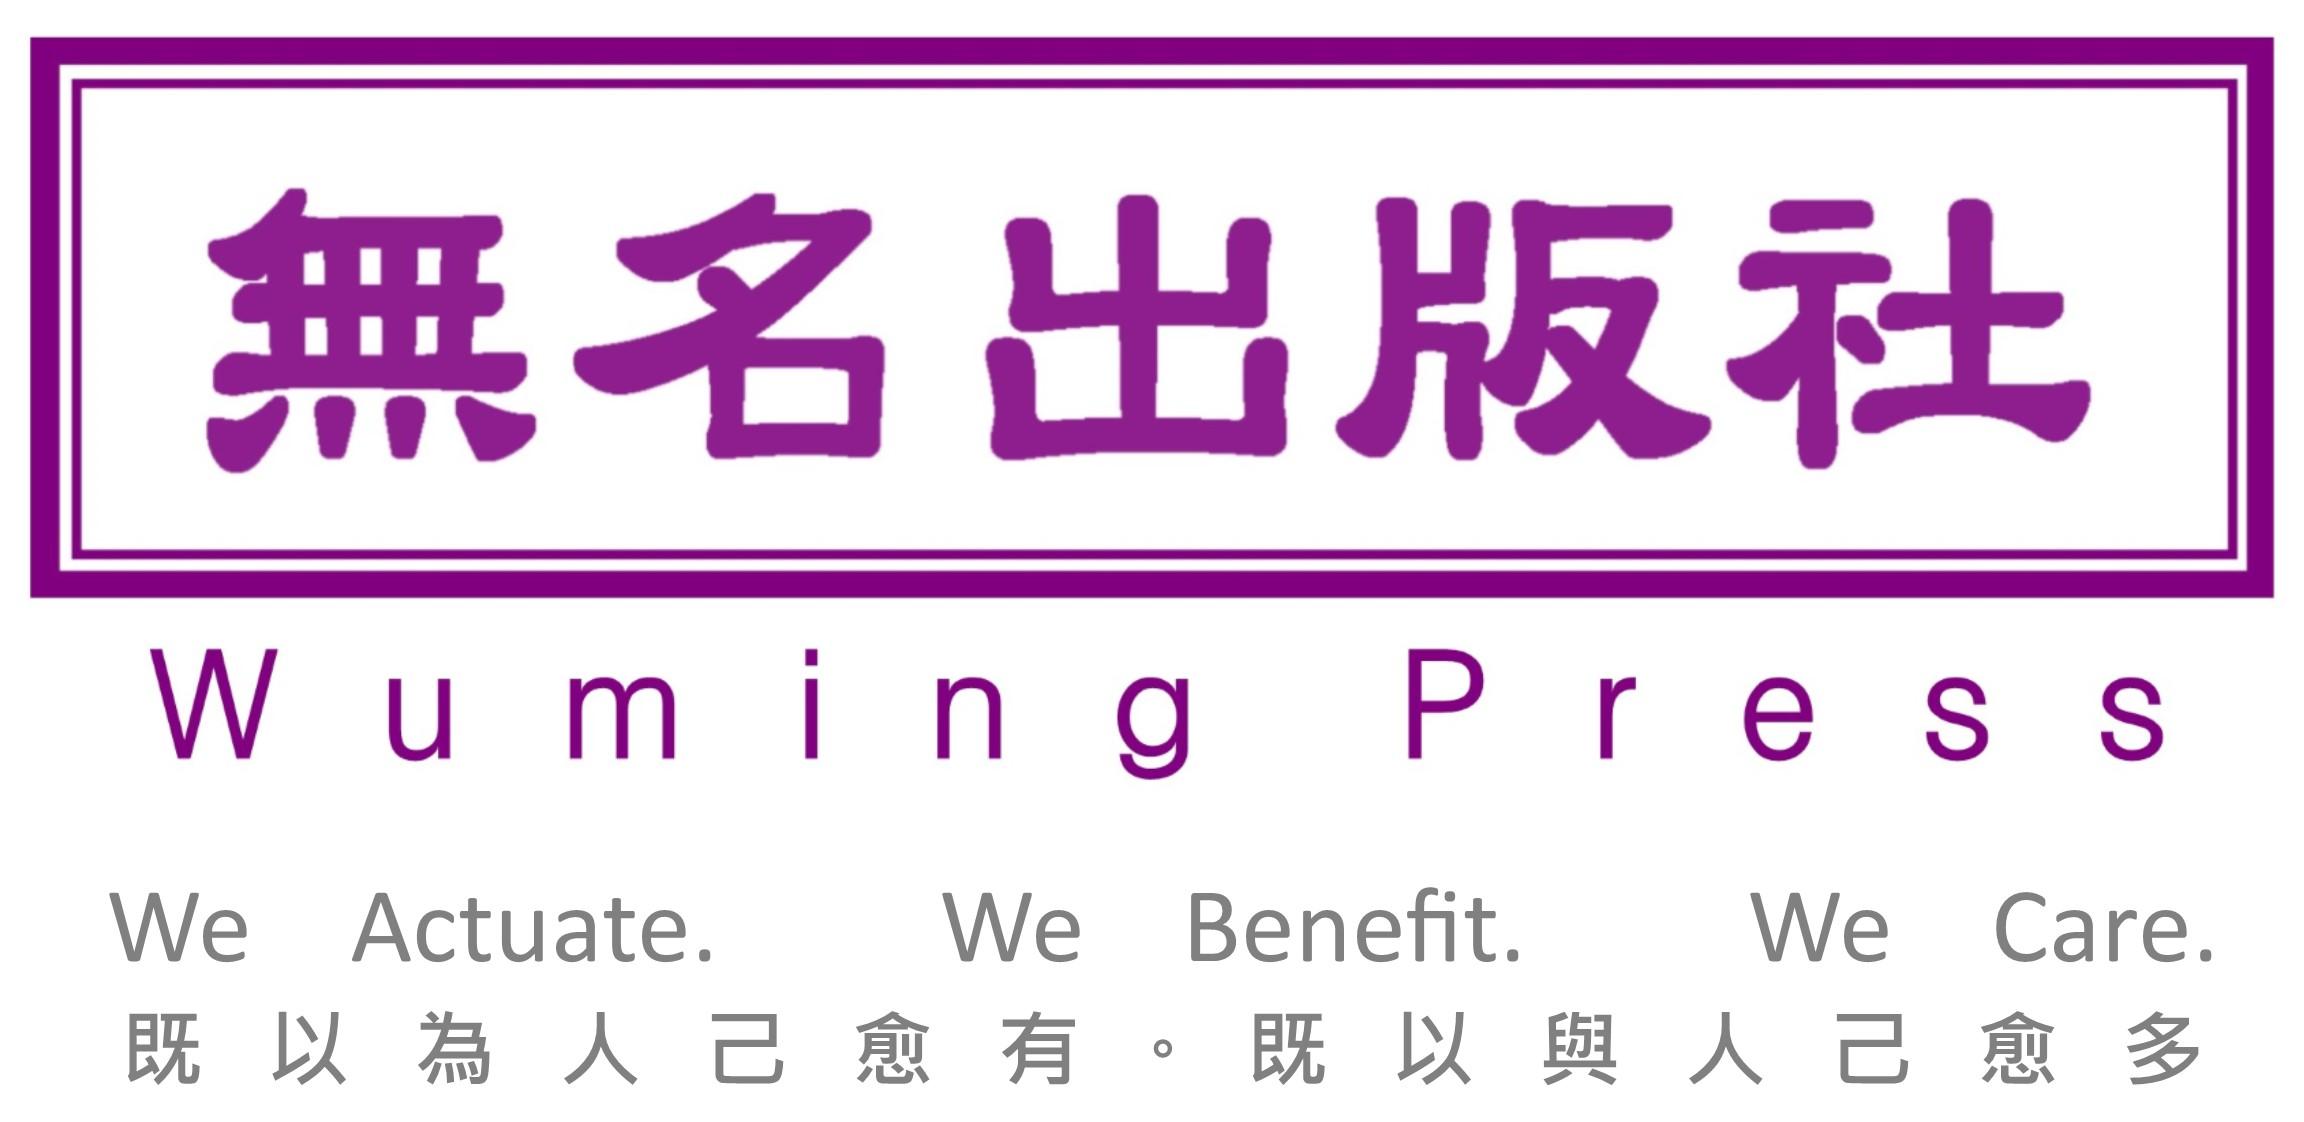 Wuming Press